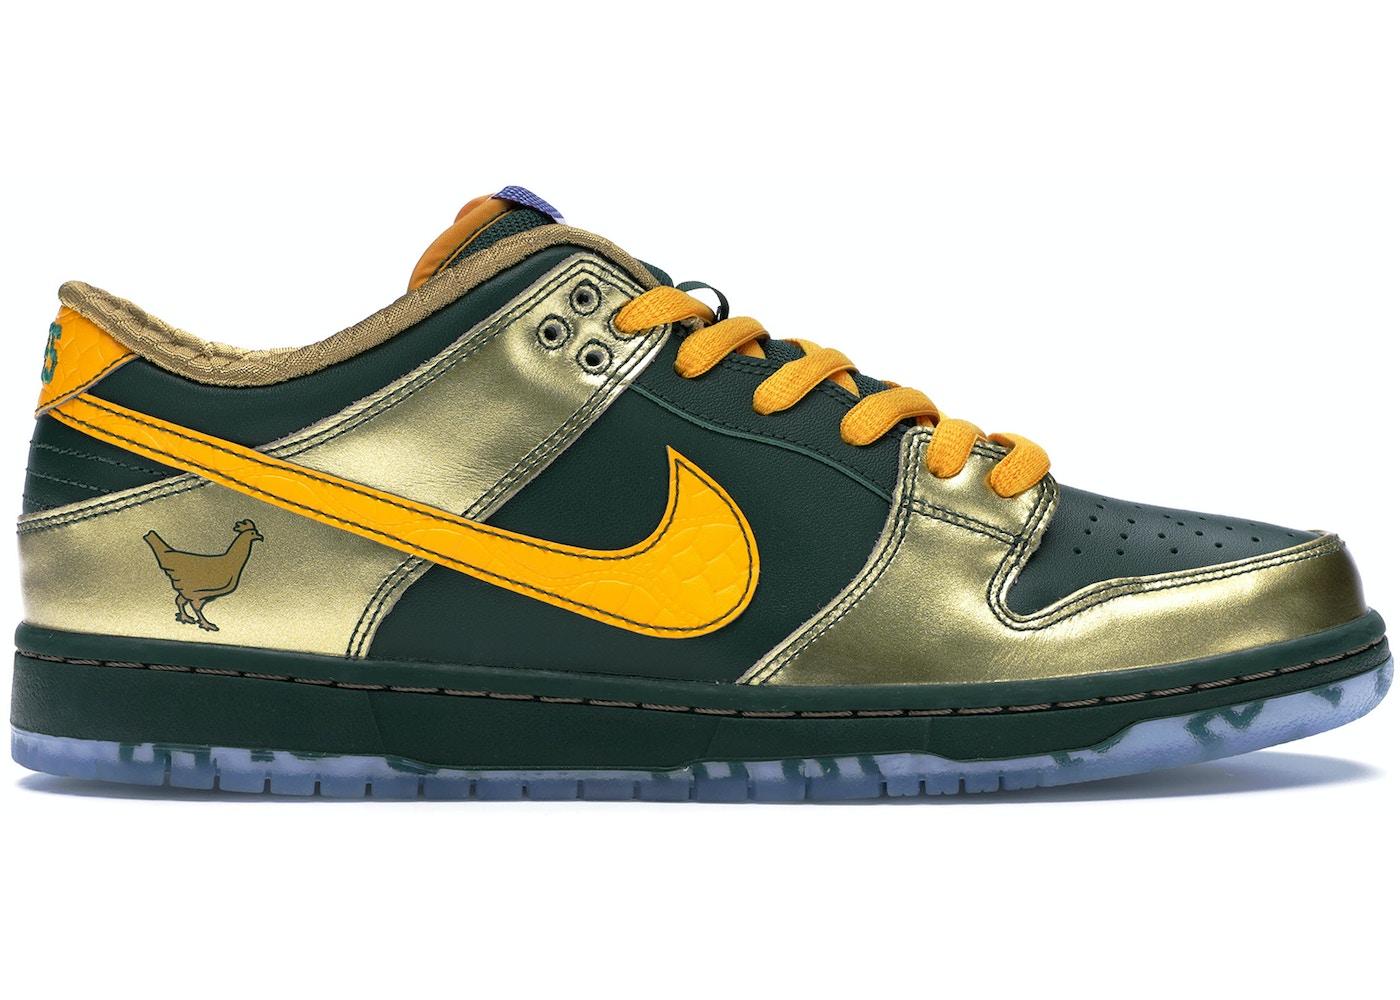 Nike SB Dunk Low Doernbecher (2018) - BV8740-377 c49f6abbc